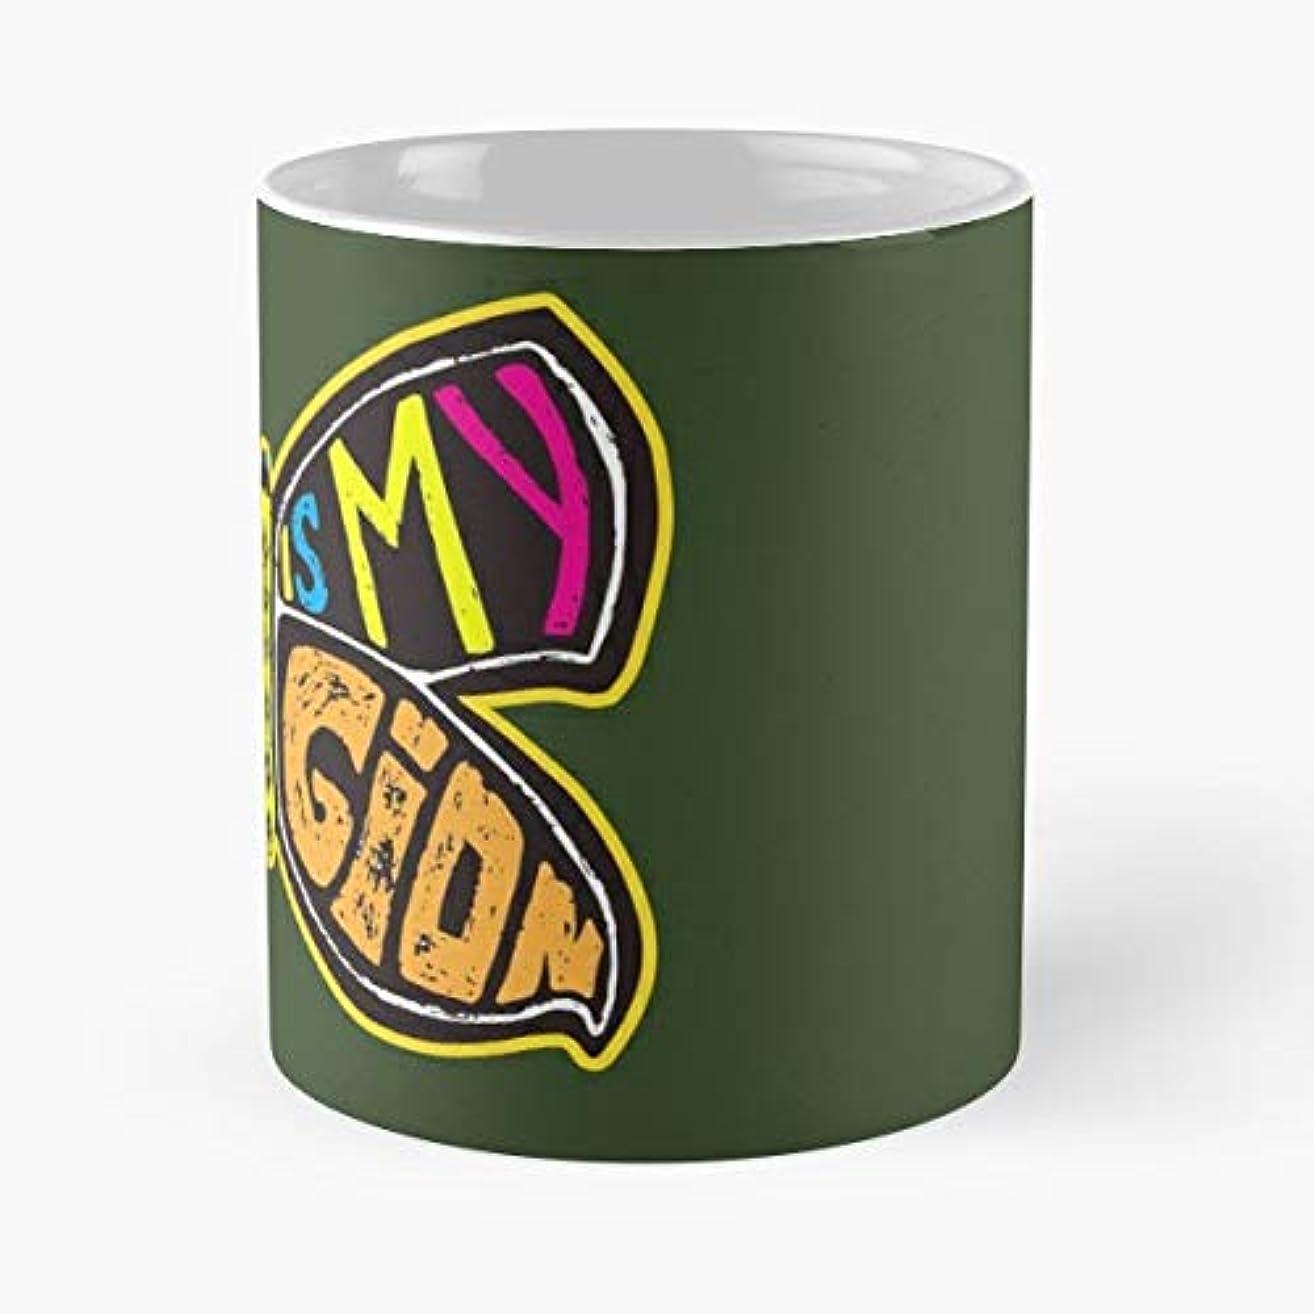 Travel Traveling Hiking Wandering - Morning Coffee Mug Ceramic Novelty, Funny Gift